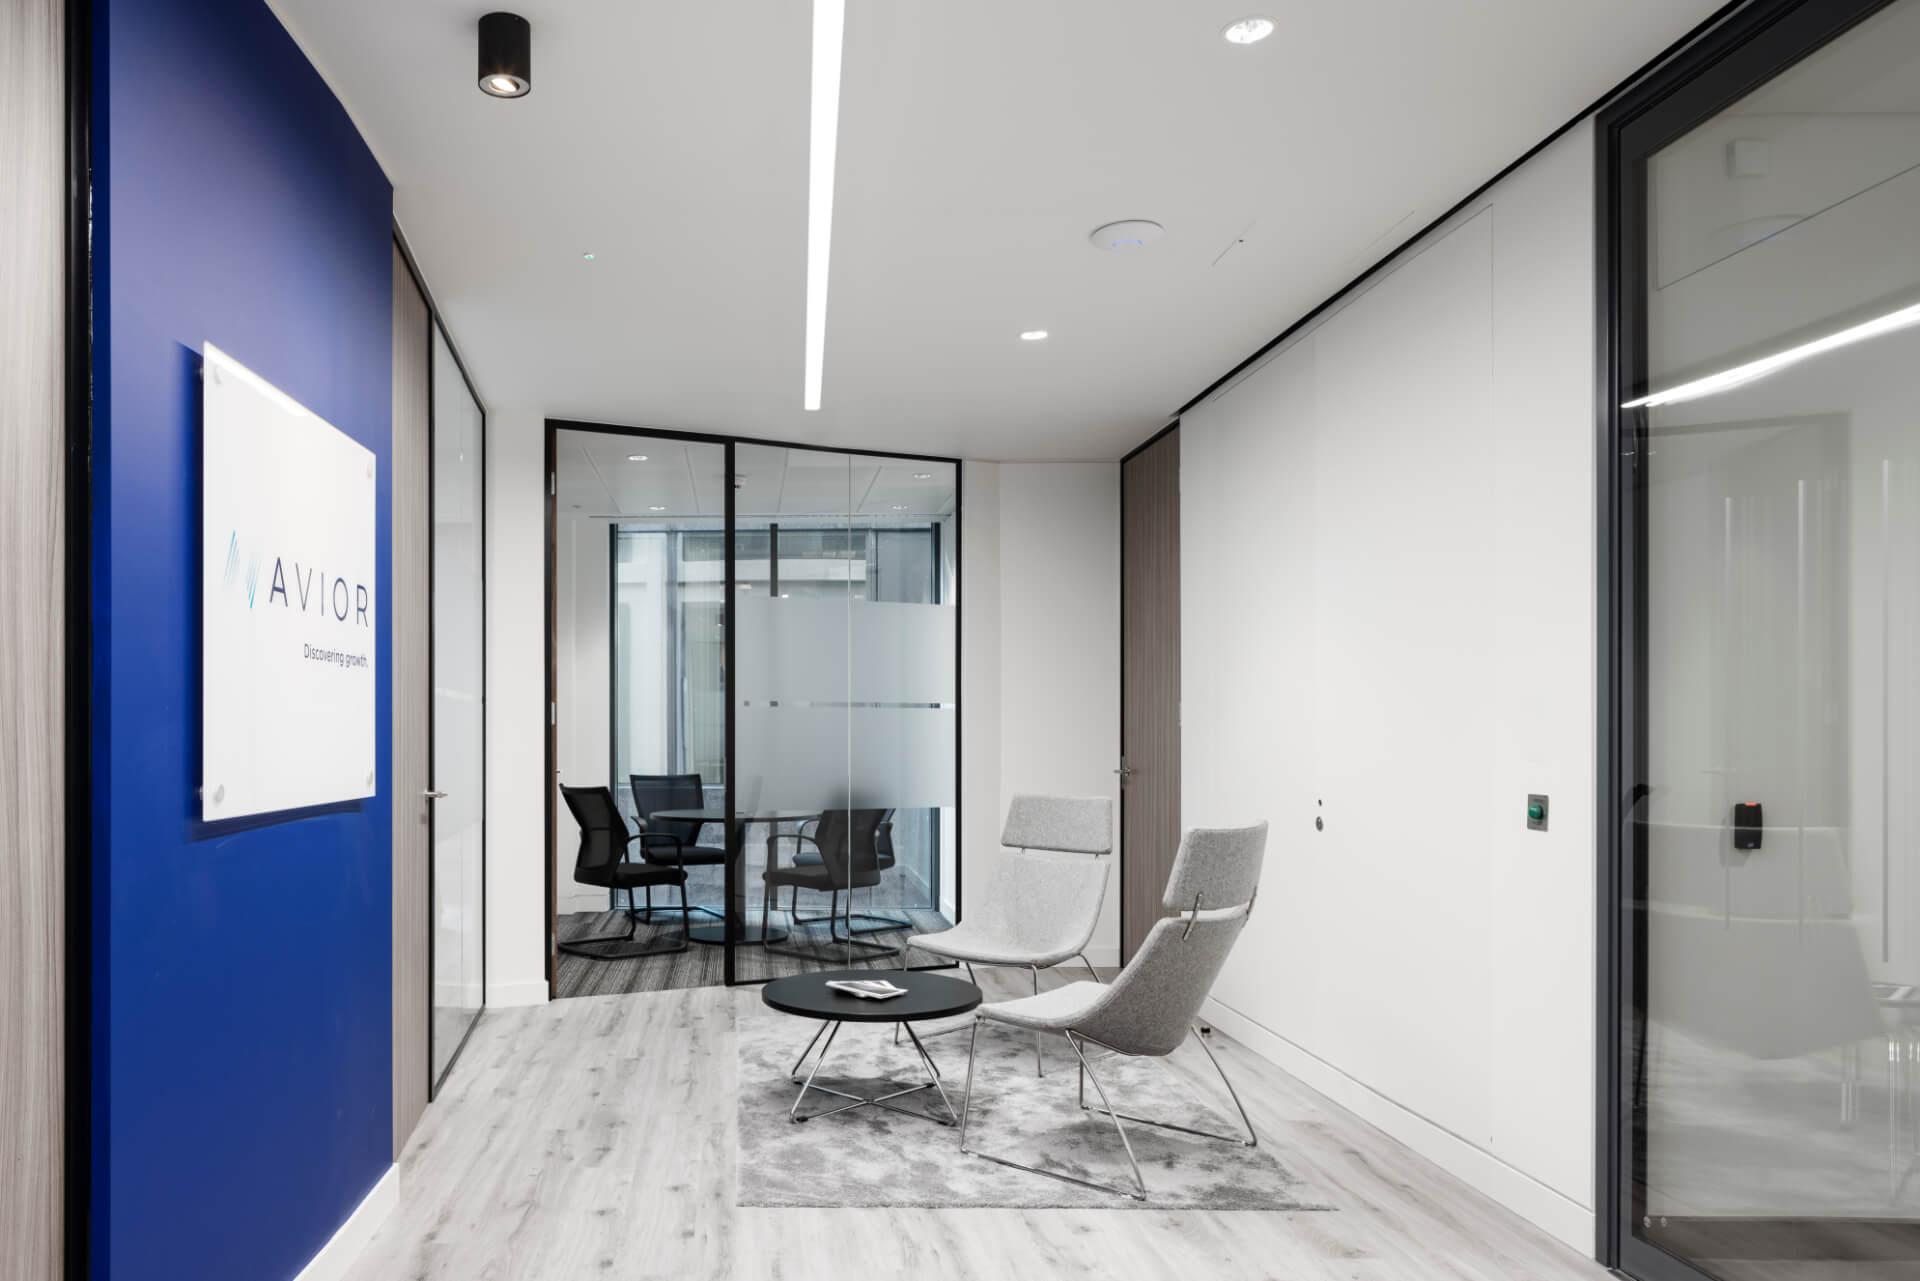 Avior Office Furniture